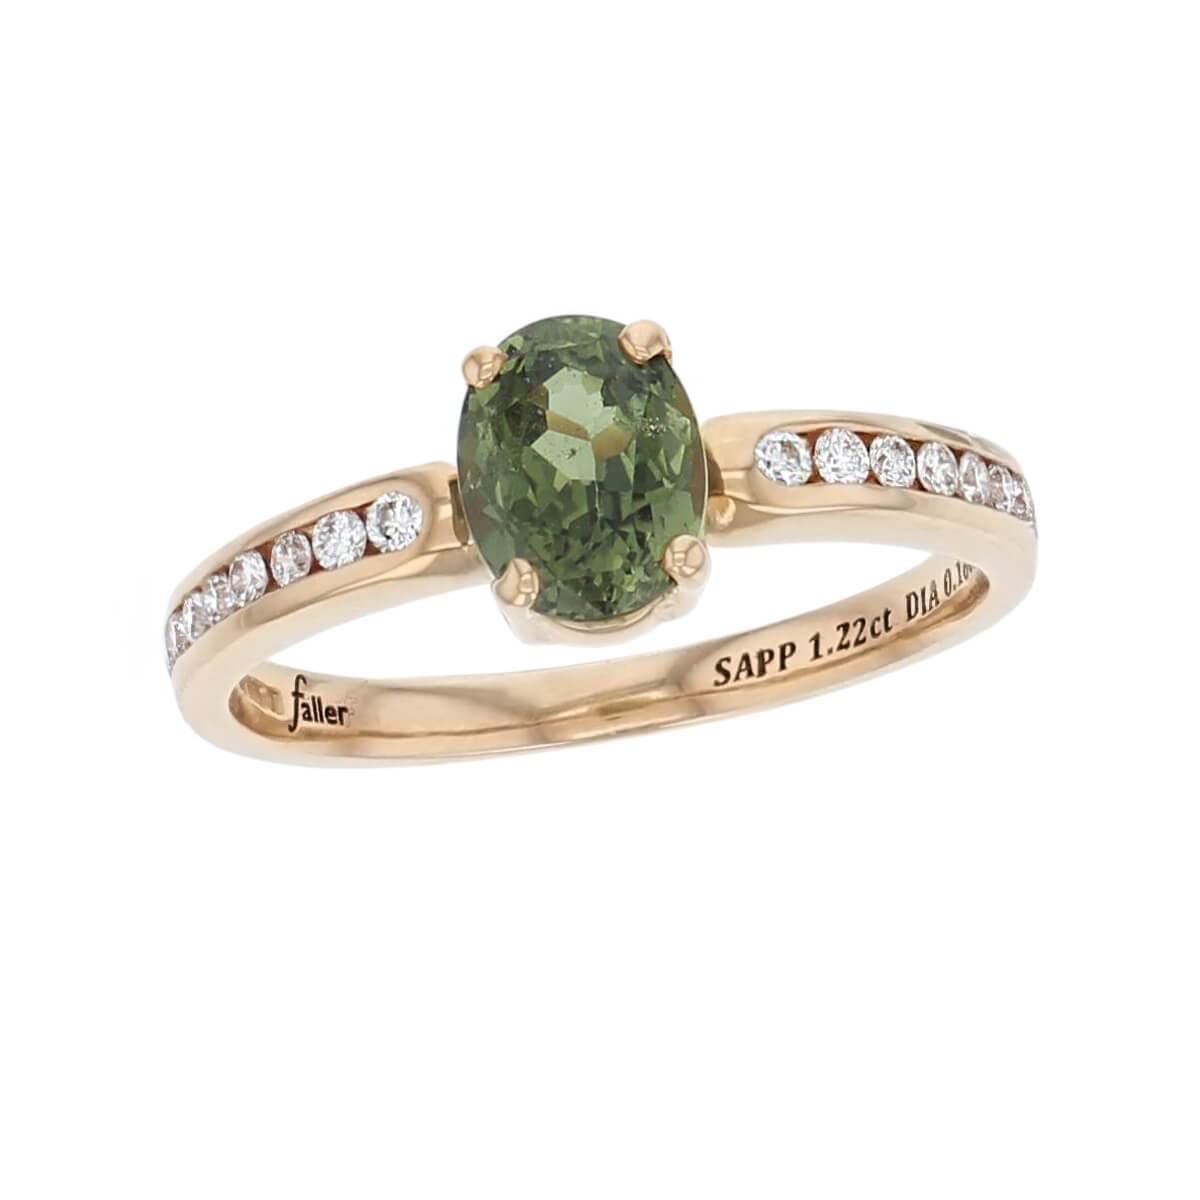 bea08e880 18ct rose gold ladies oval cut green tourmaline & diamond designer multi  stone dress ring designed